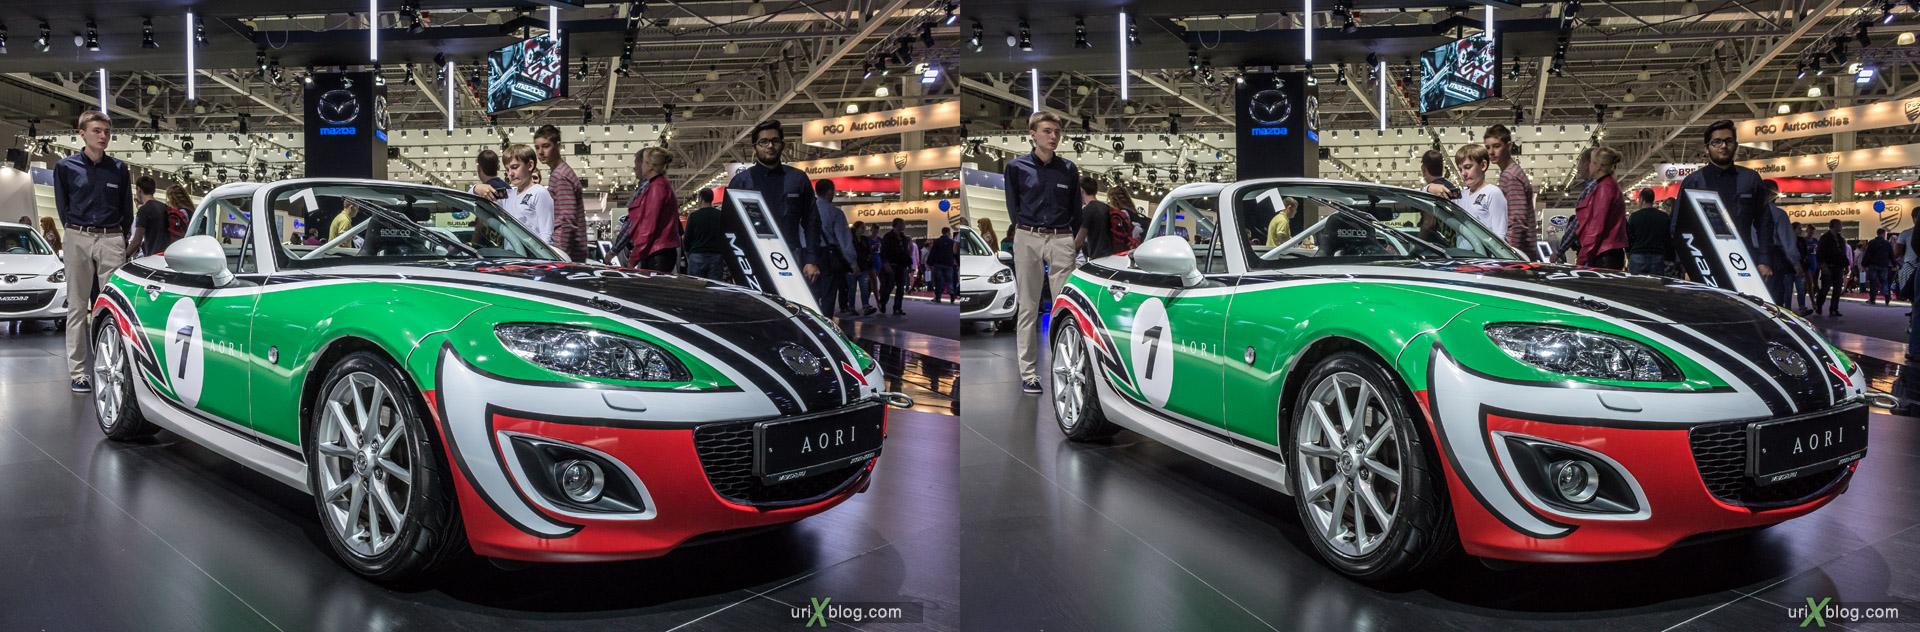 2014, Aori, Moscow International Automobile Salon, MIAS, Crocus Expo, Moscow, Russia, augest, 3D, stereo pair, cross-eyed, crossview, cross view stereo pair, stereoscopic